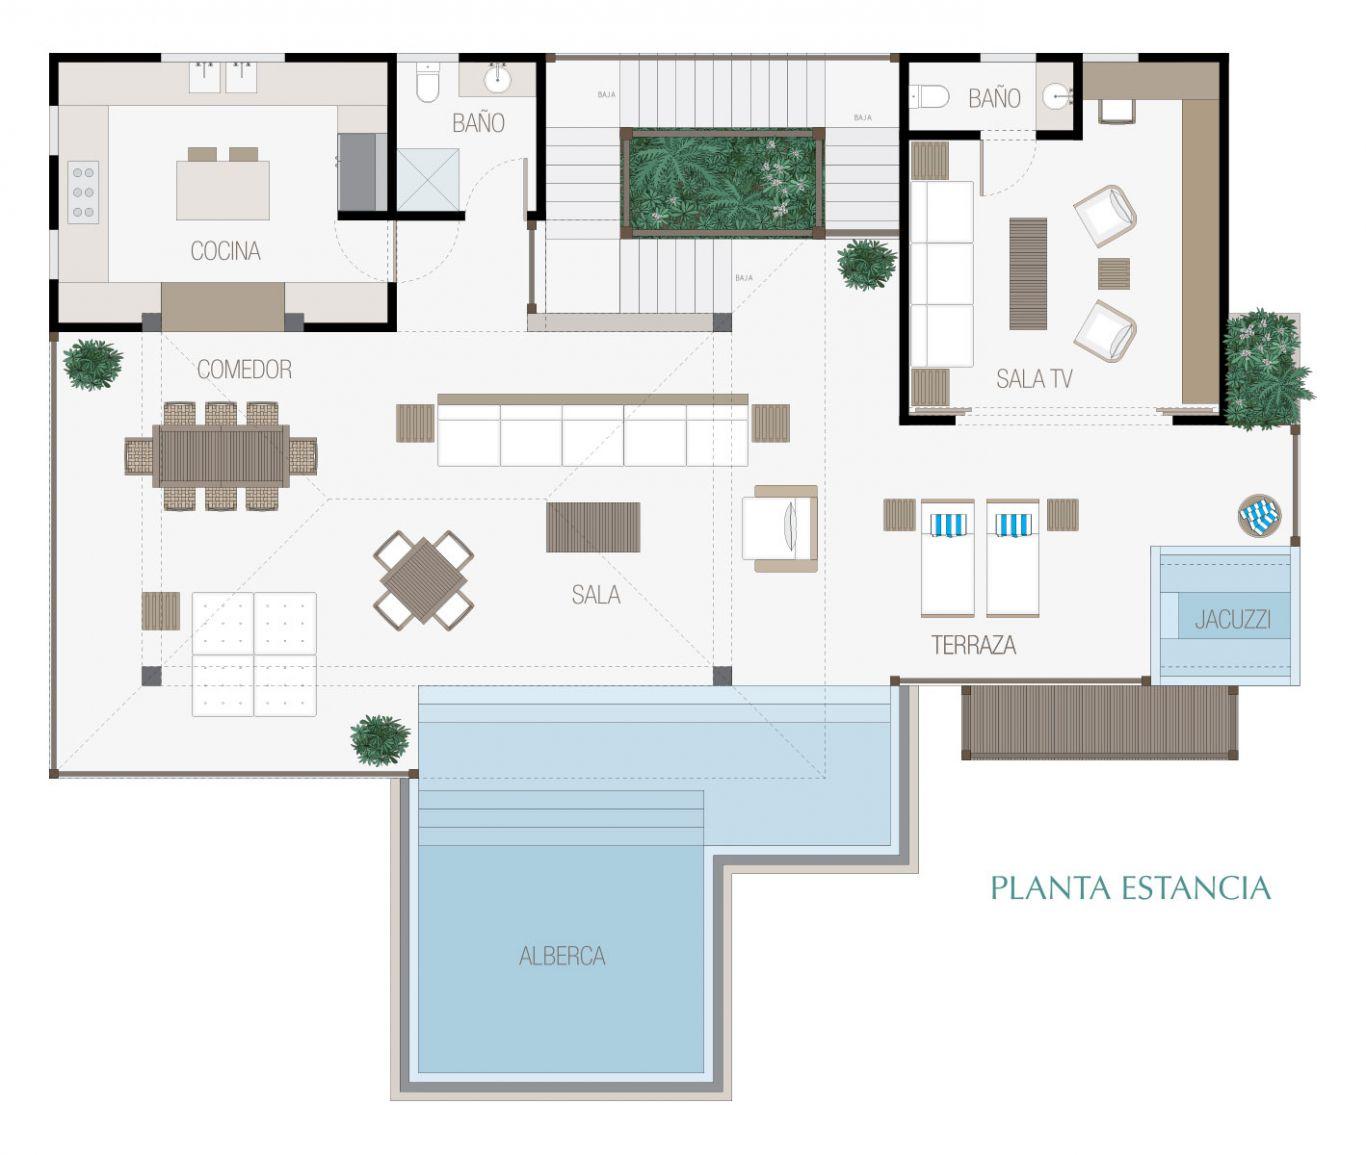 Manai, id 1519068, no 4, plano de villa 7, 290